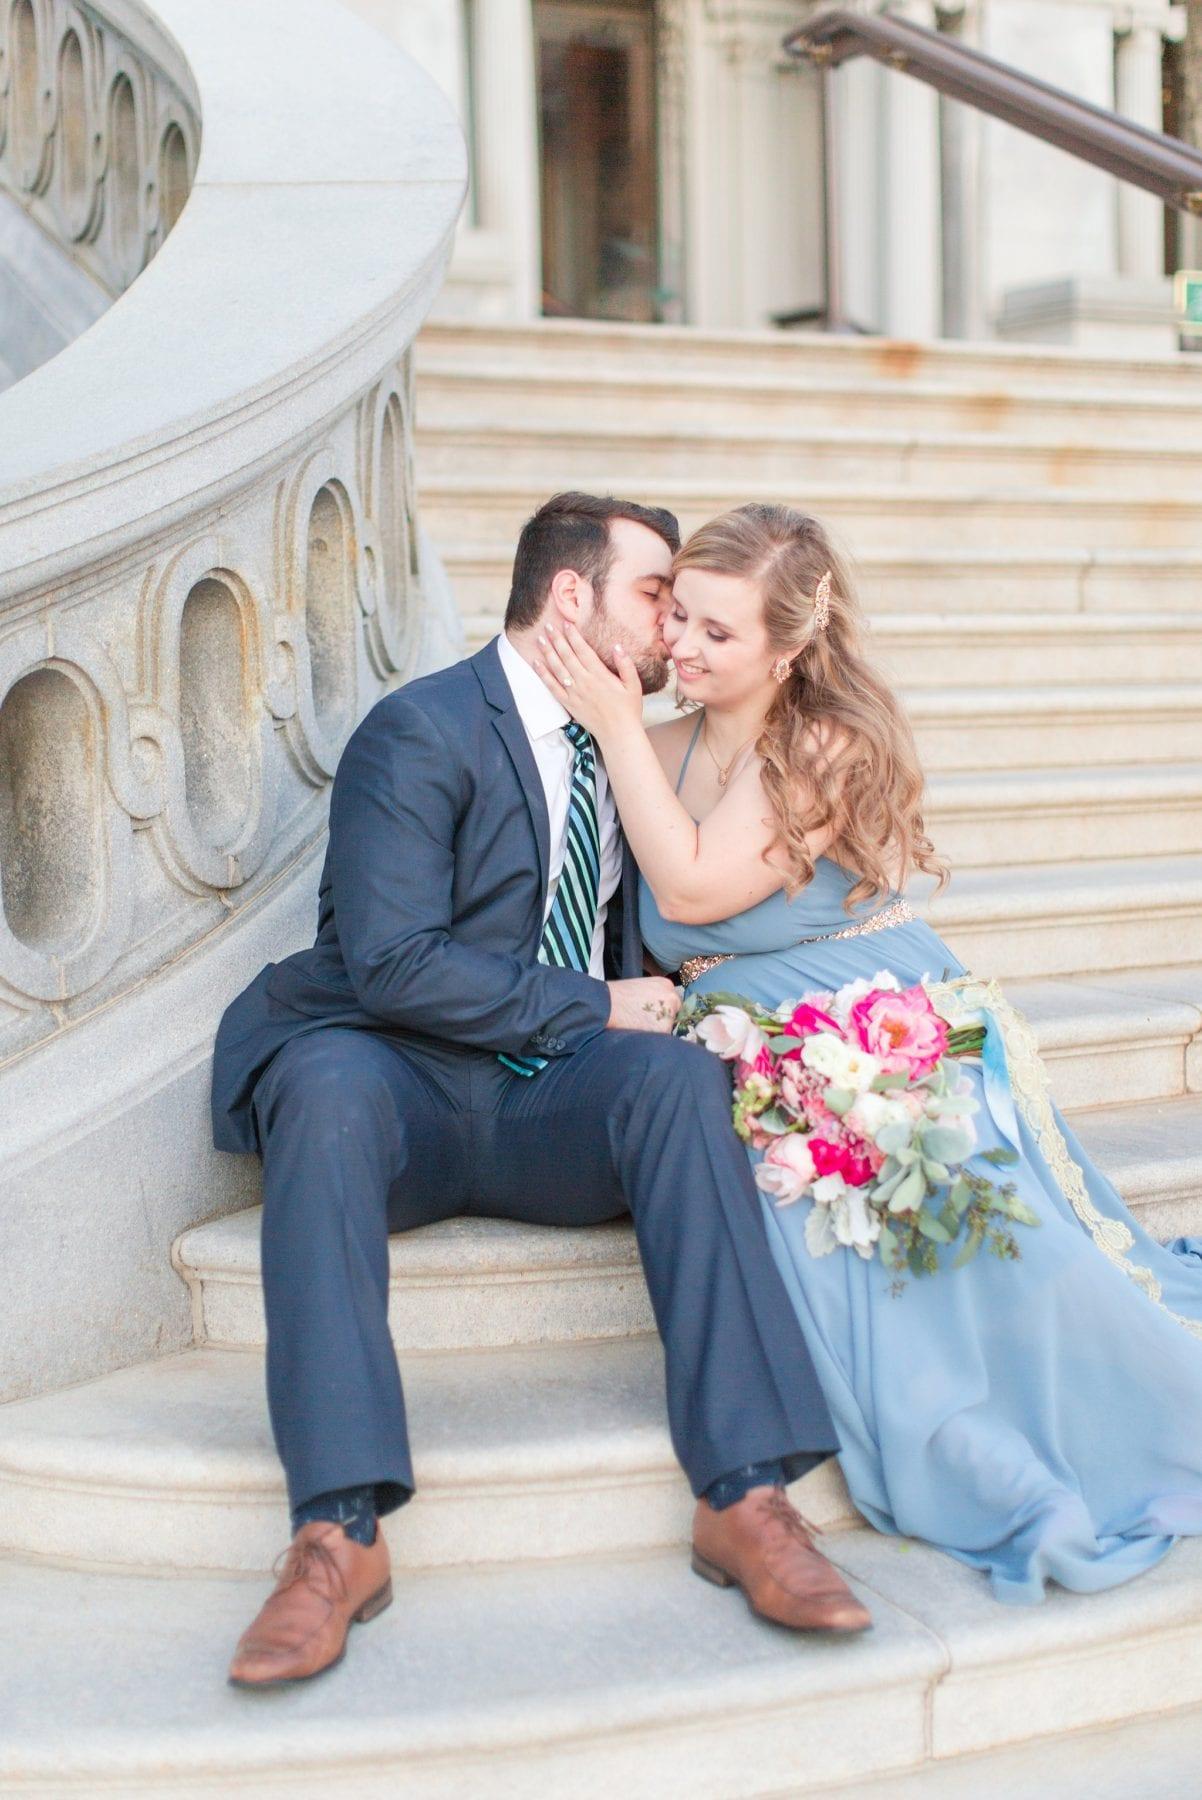 Capitol Hill Engagement Photos Kelly & Zach Washington DC Wedding Photographer Megan Kelsey Photography-350.jpg